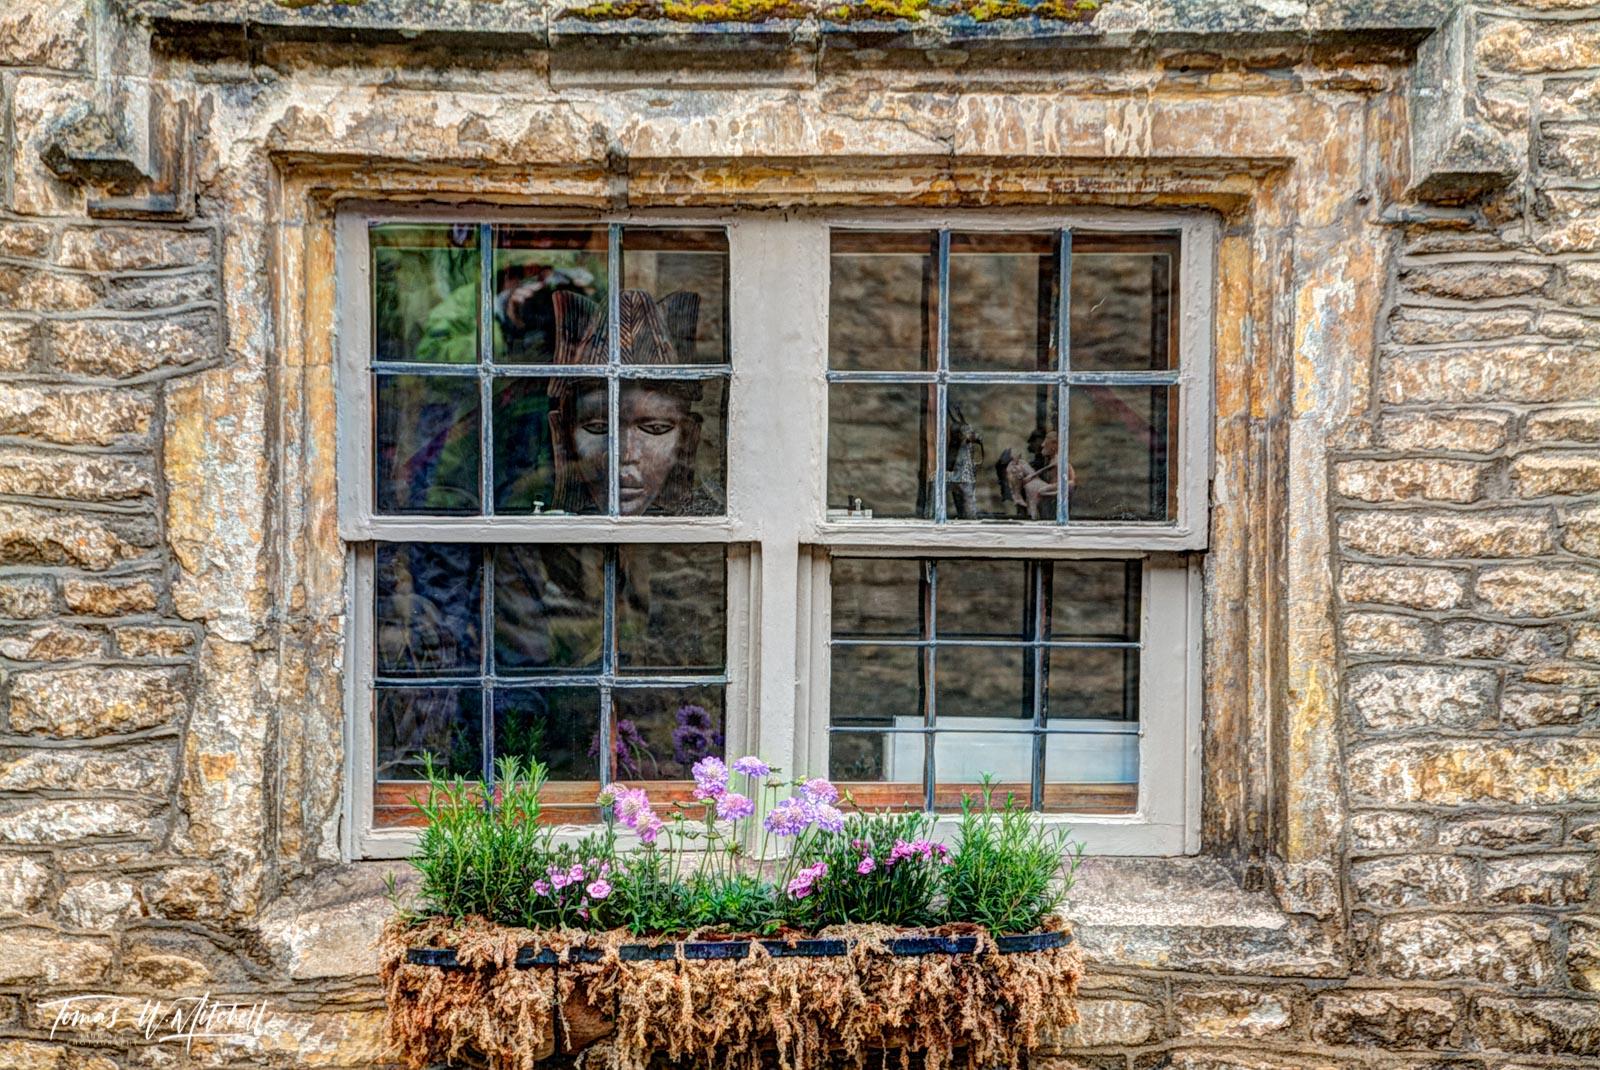 Fine Art, Museum Grade, prints, England, Castle Combe, Cotswolds, mask, window, photograph, photo